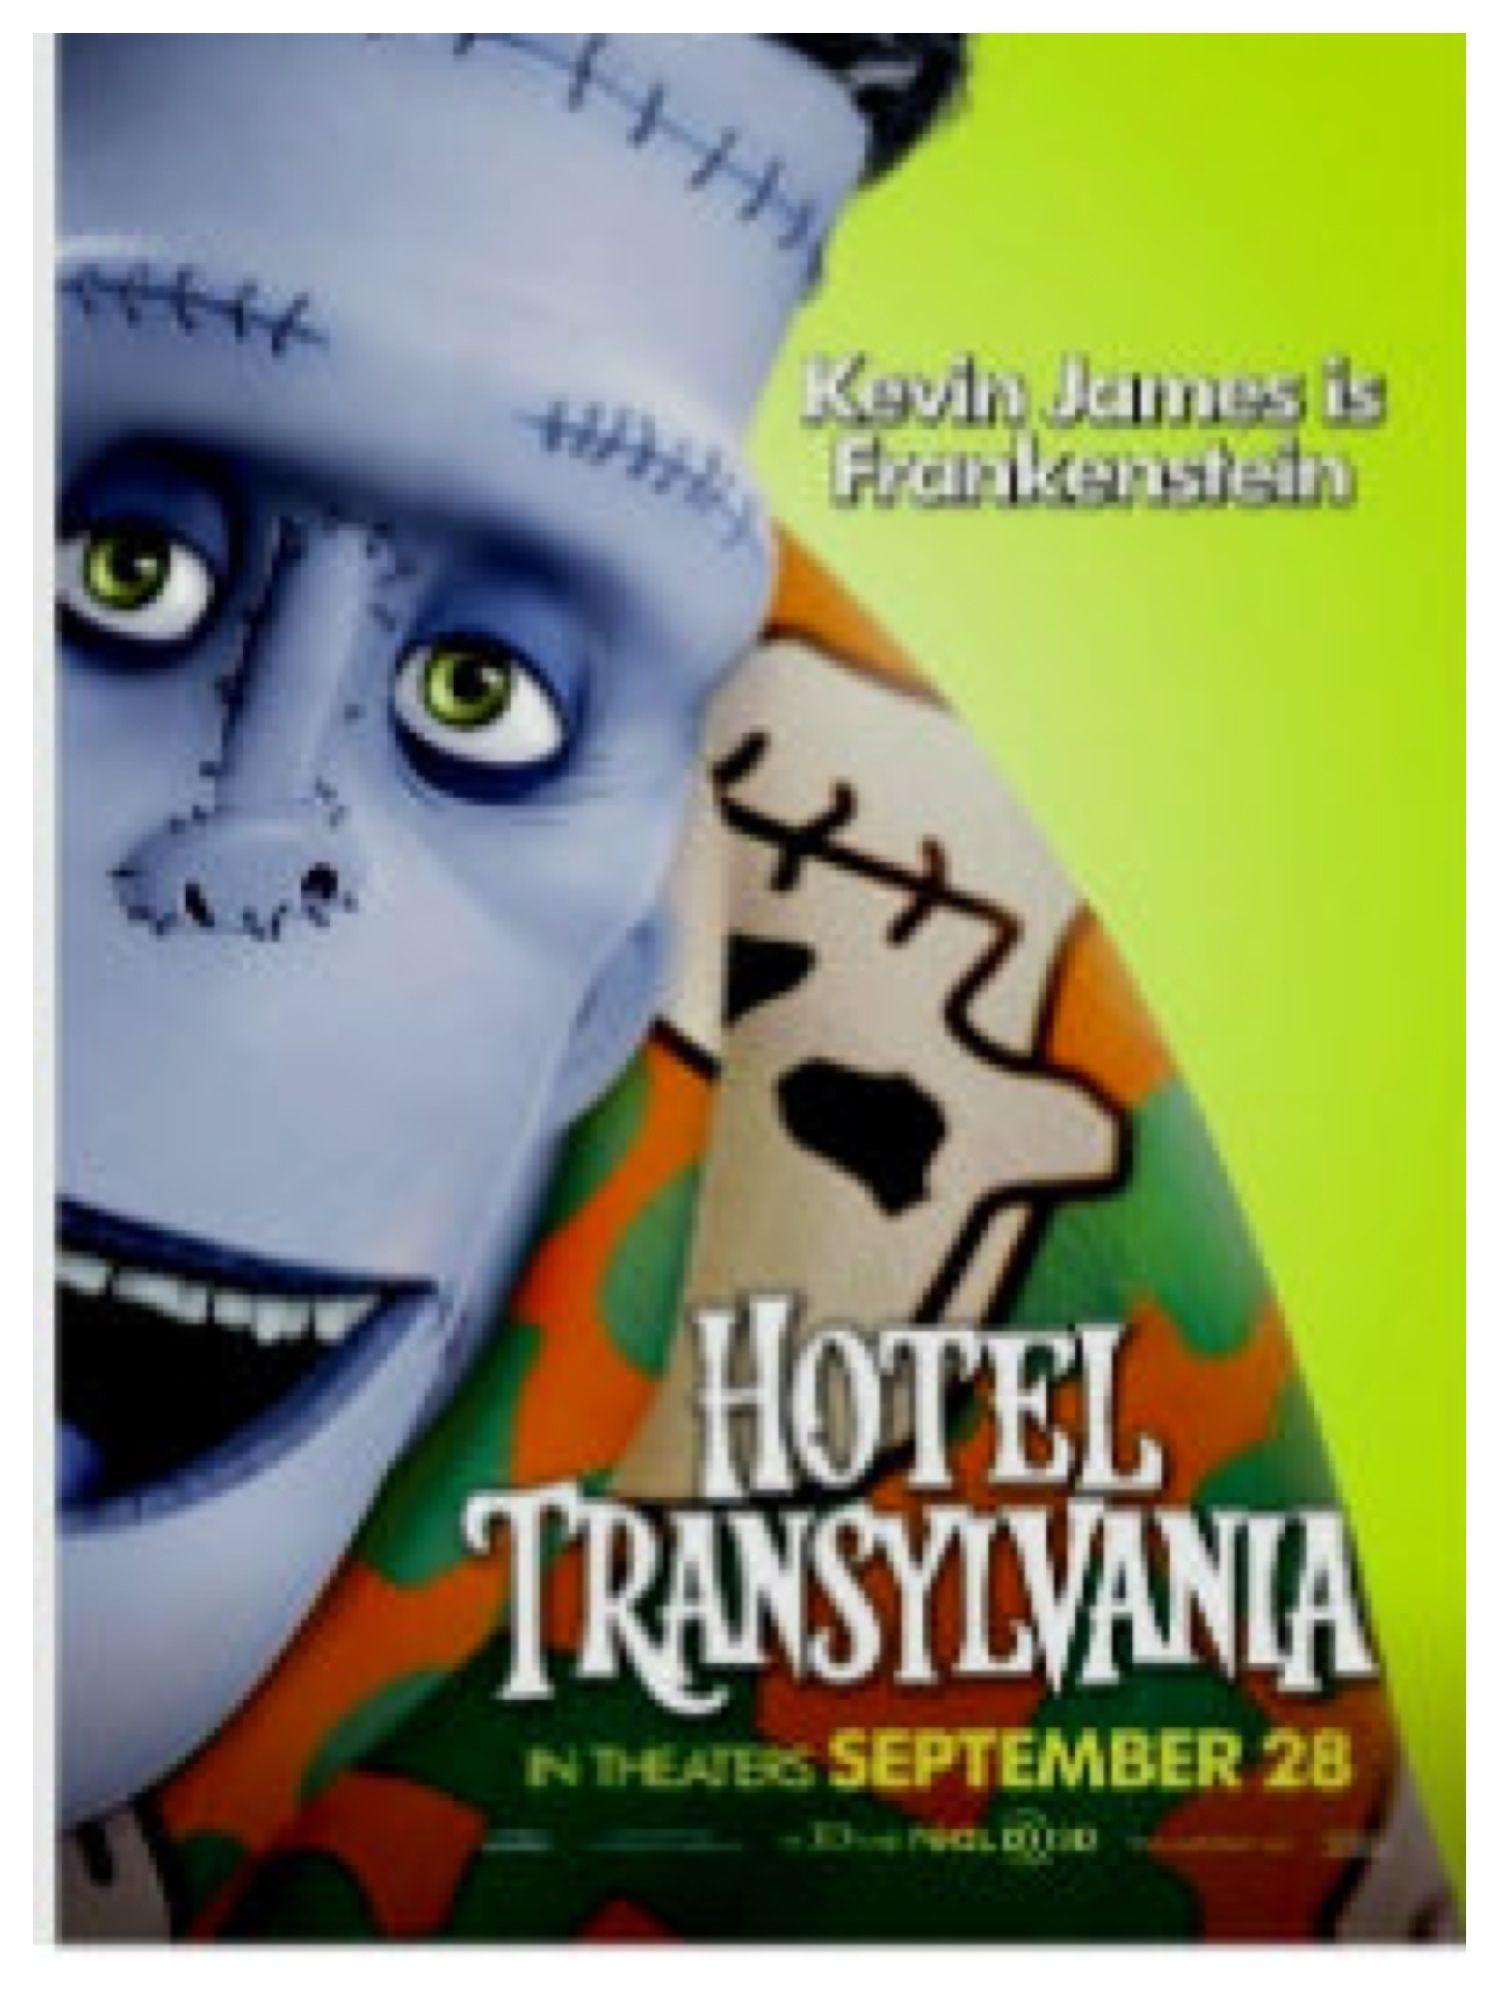 Frankenstein from hotel Transylvania Hotel transylvania